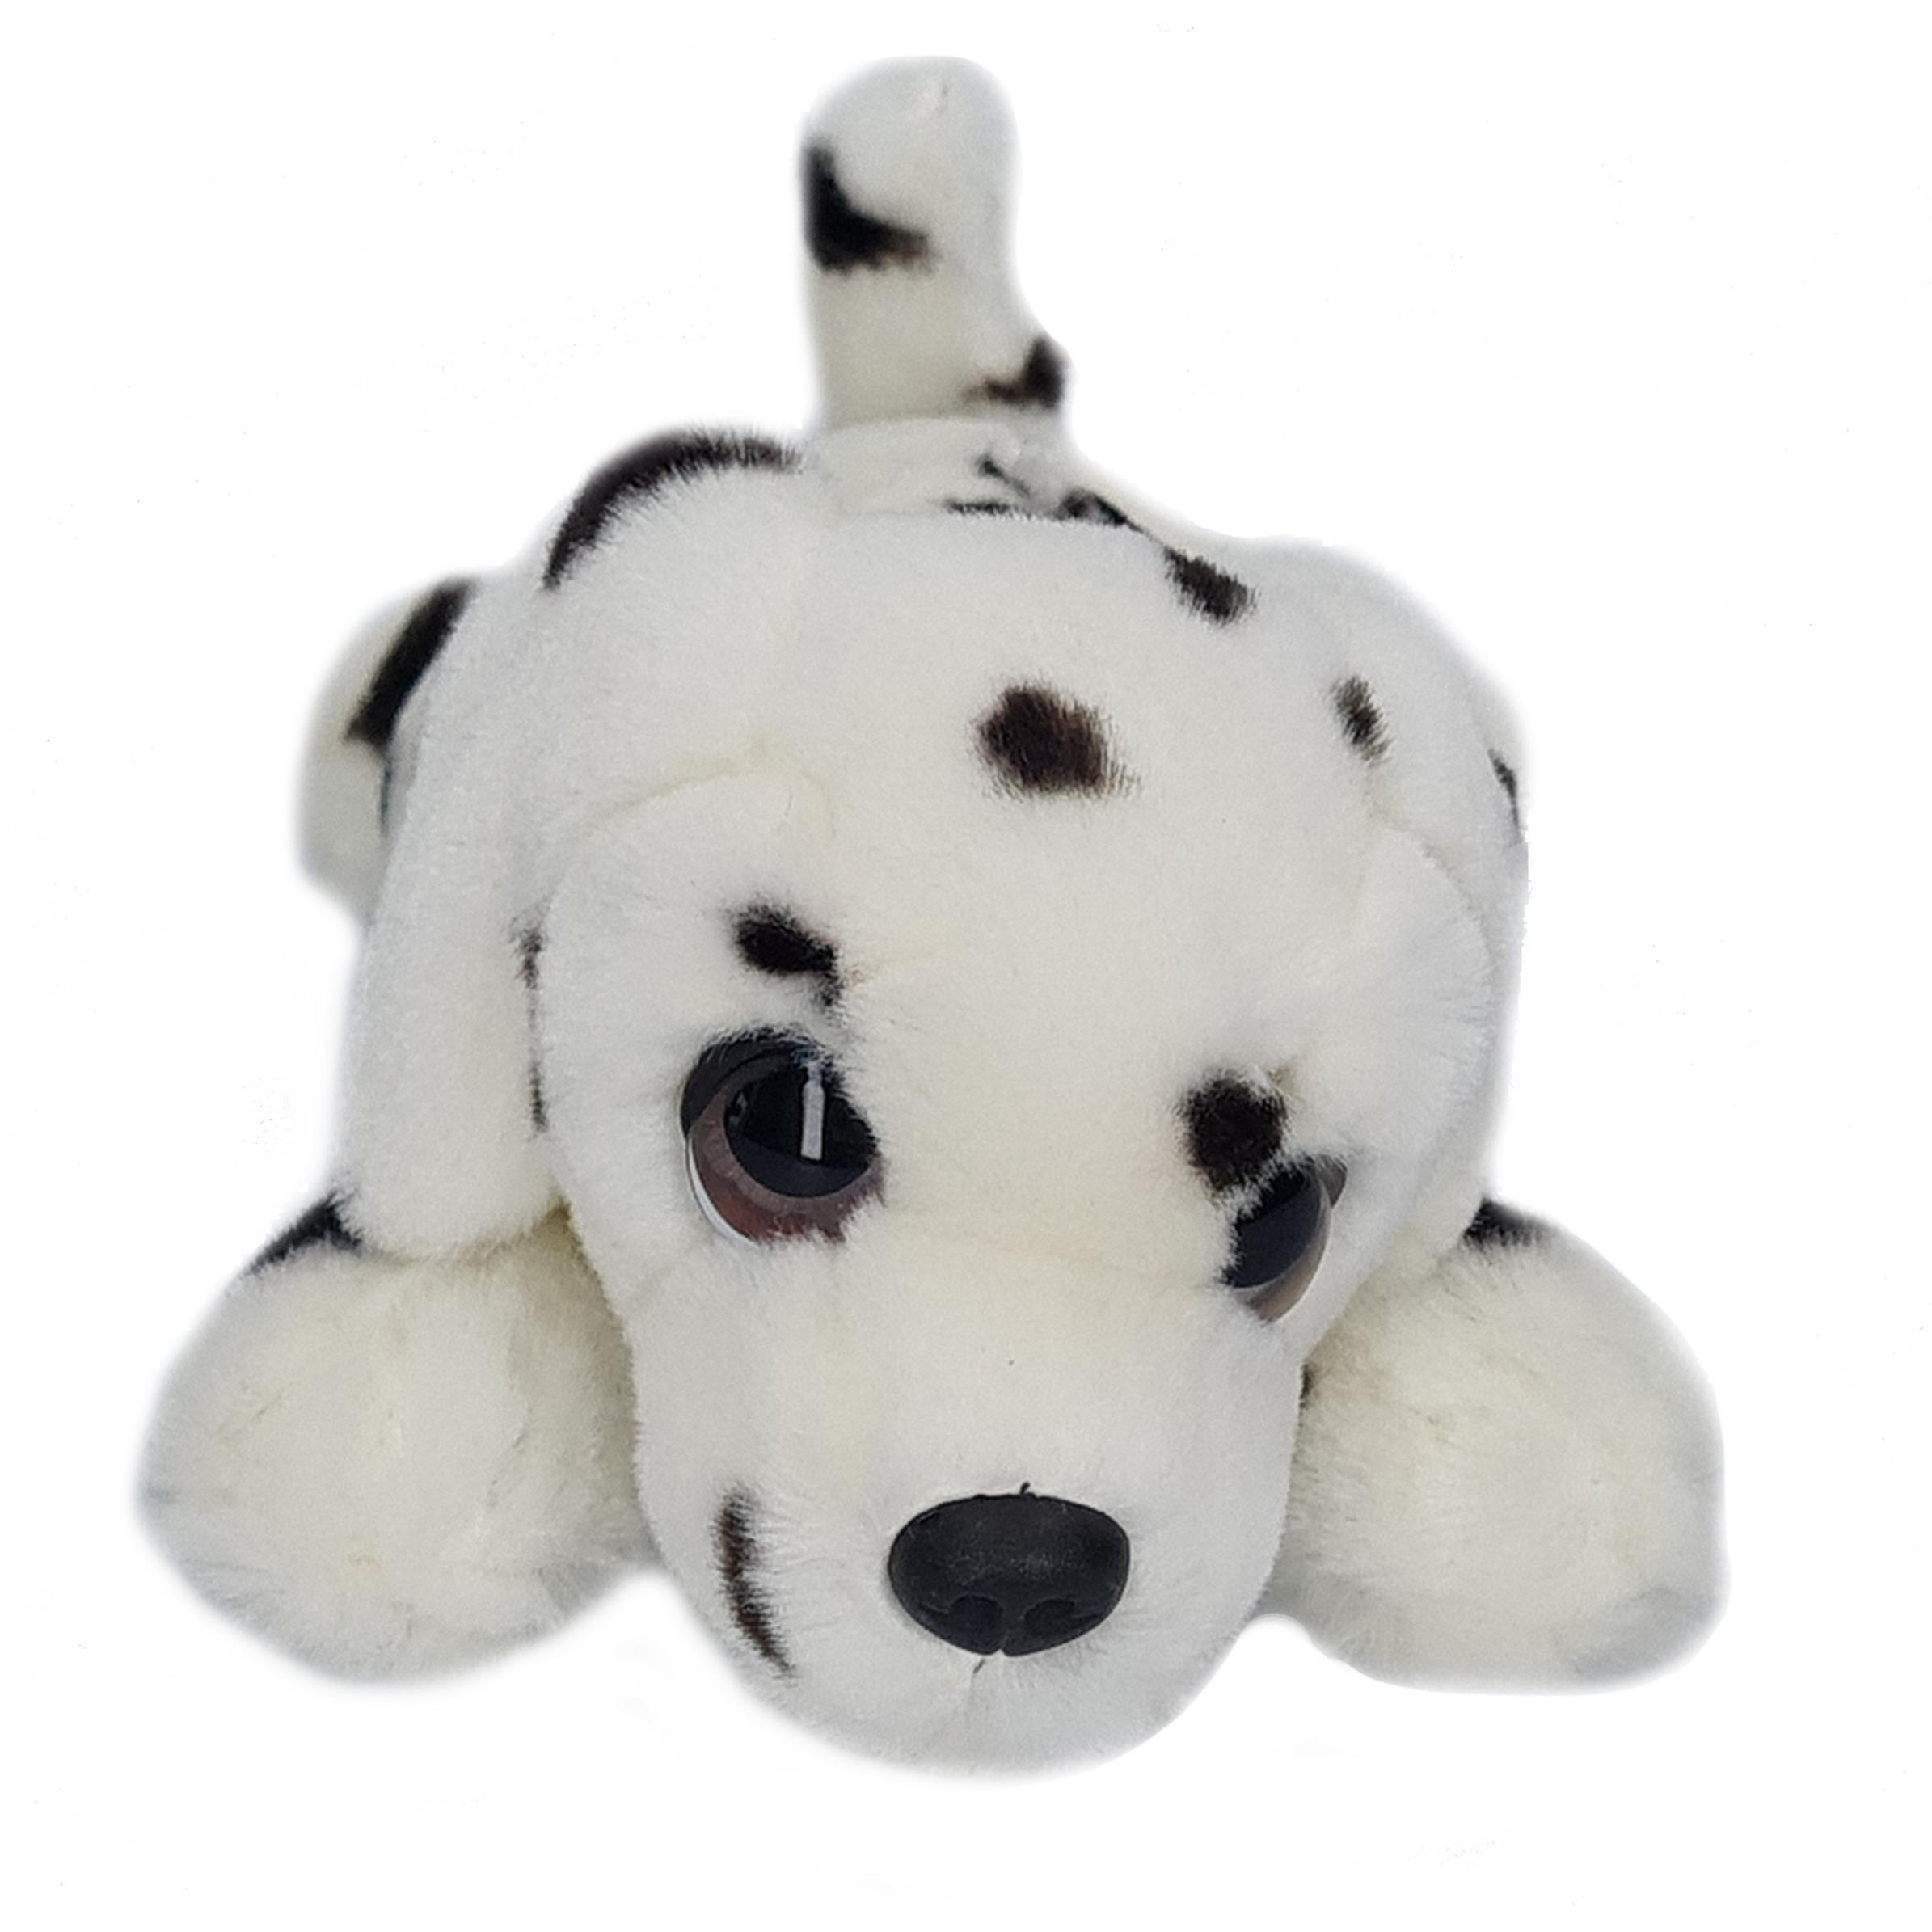 Pluche wit met zwarte stippen Dalmatier honden knuffel 25 cm